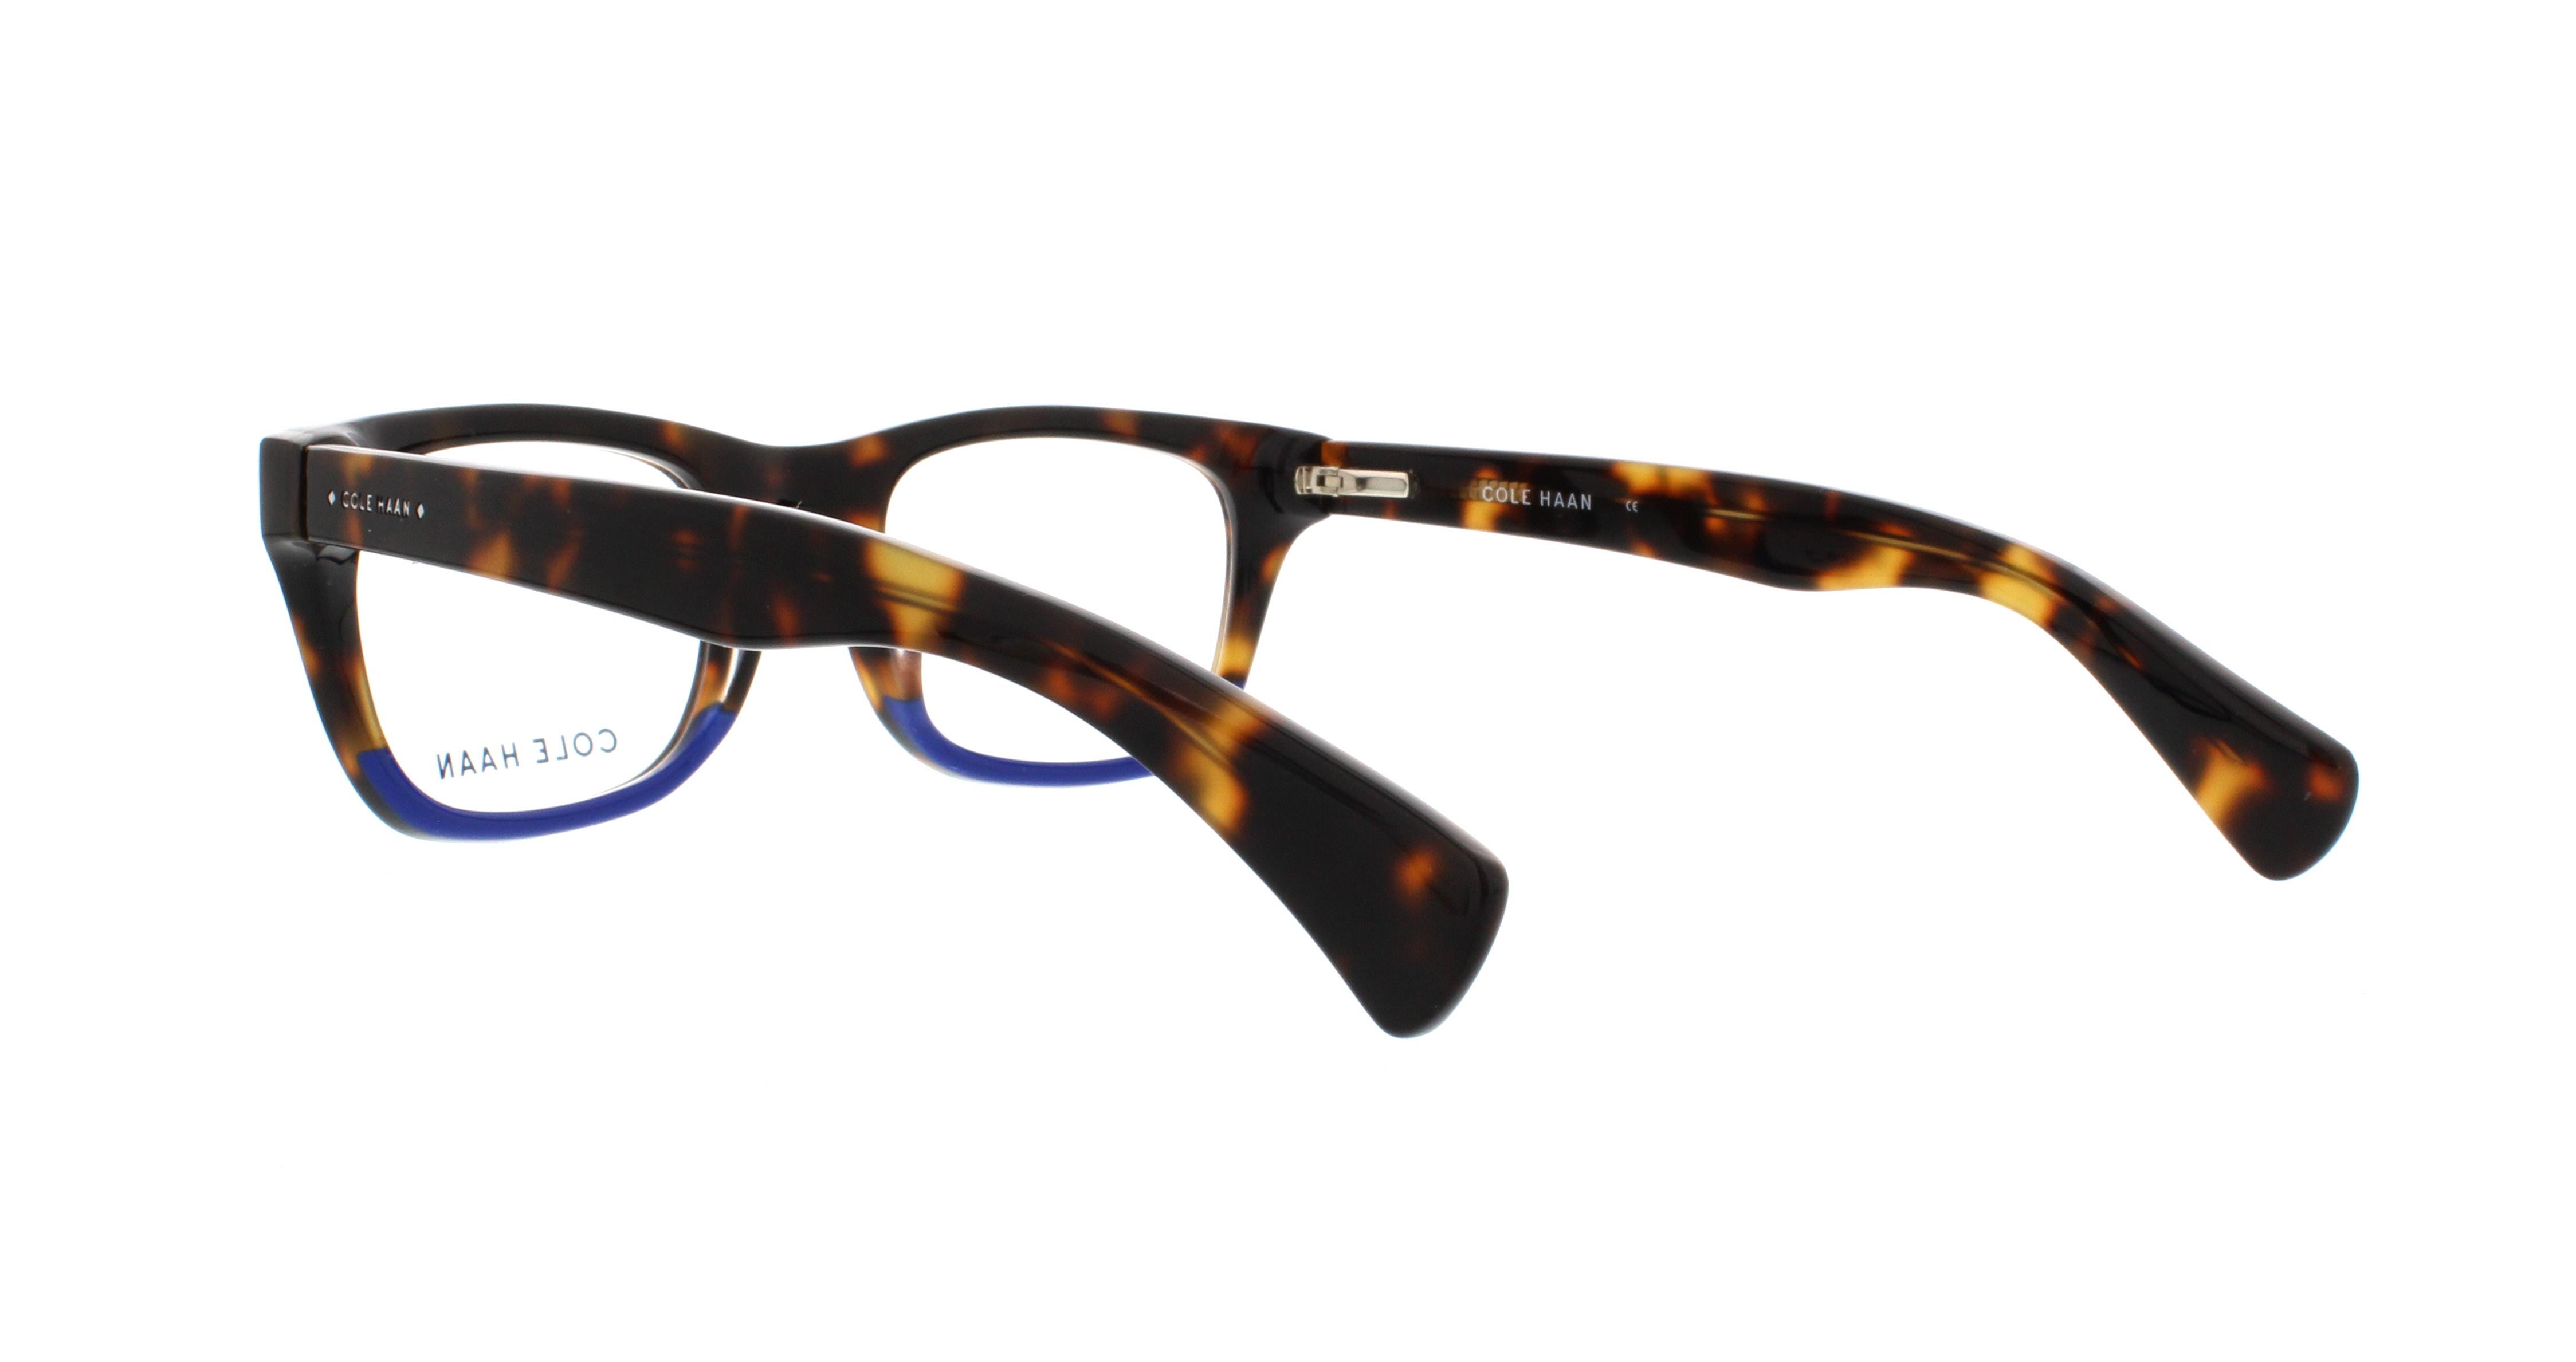 COLE HAAN Eyeglasses CH4007 240 Soft Tortoise 50MM | eBay